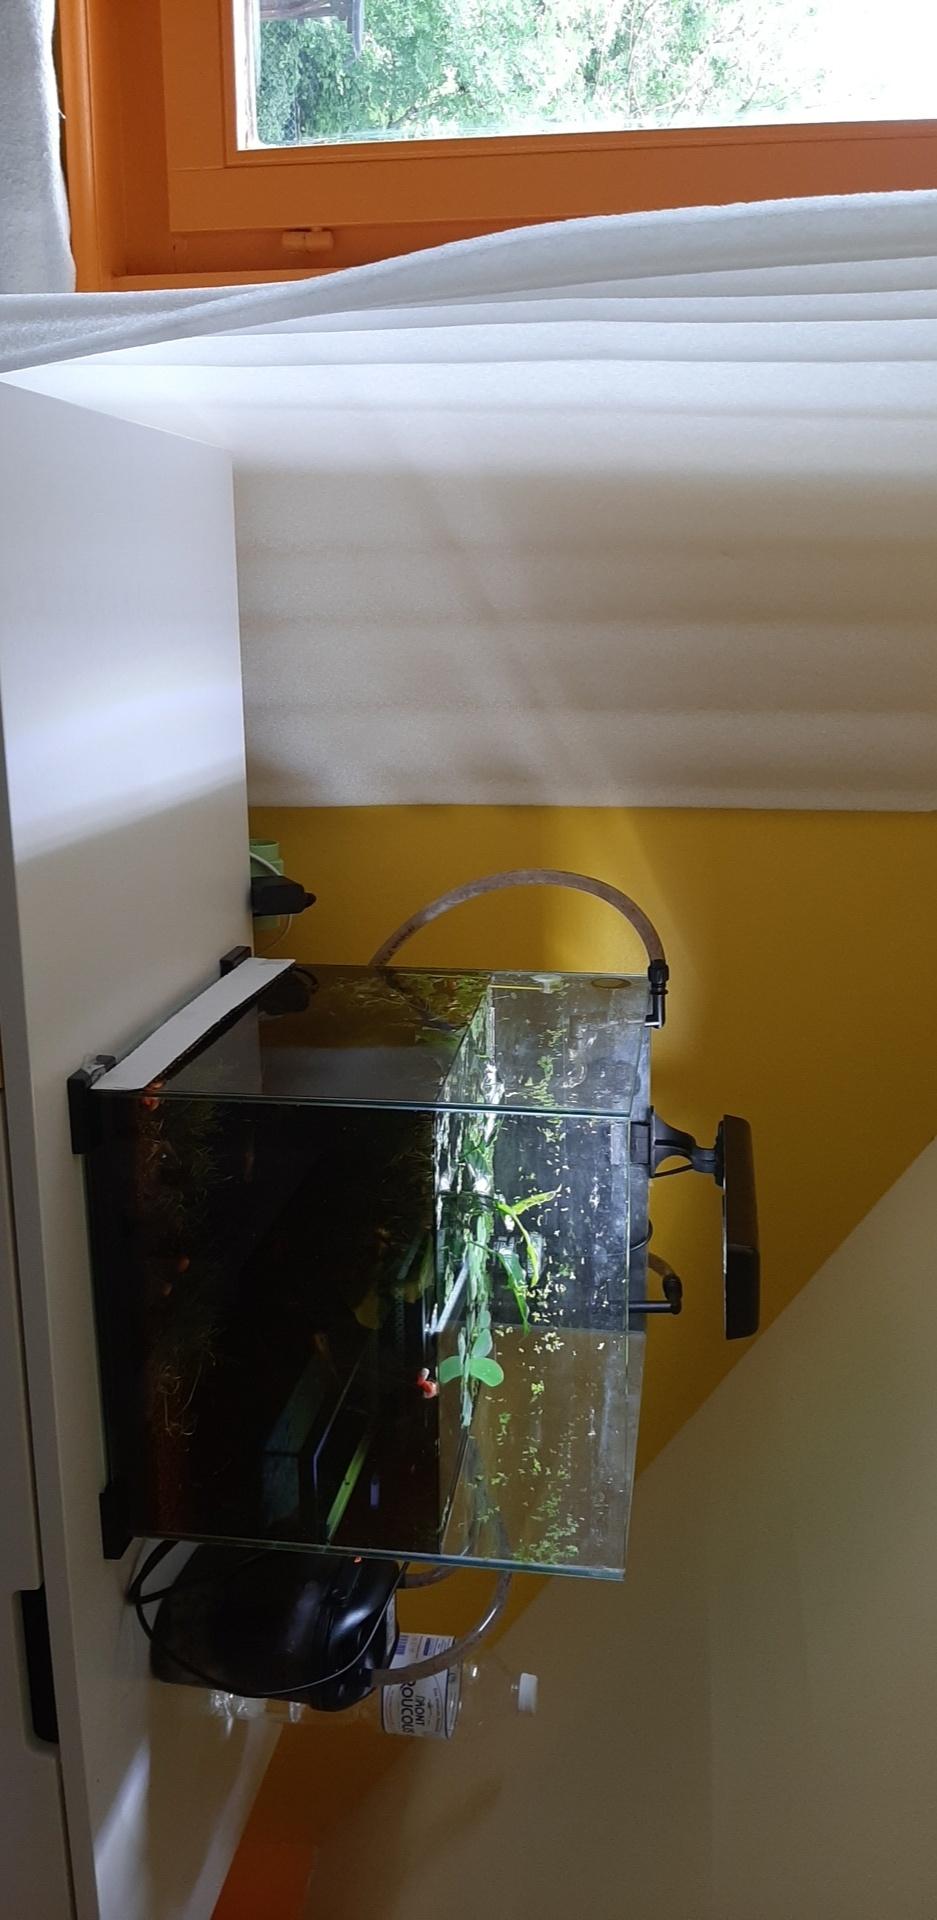 [RÉSOLU] Déplacer un aquarium de 30 litres Snapch62